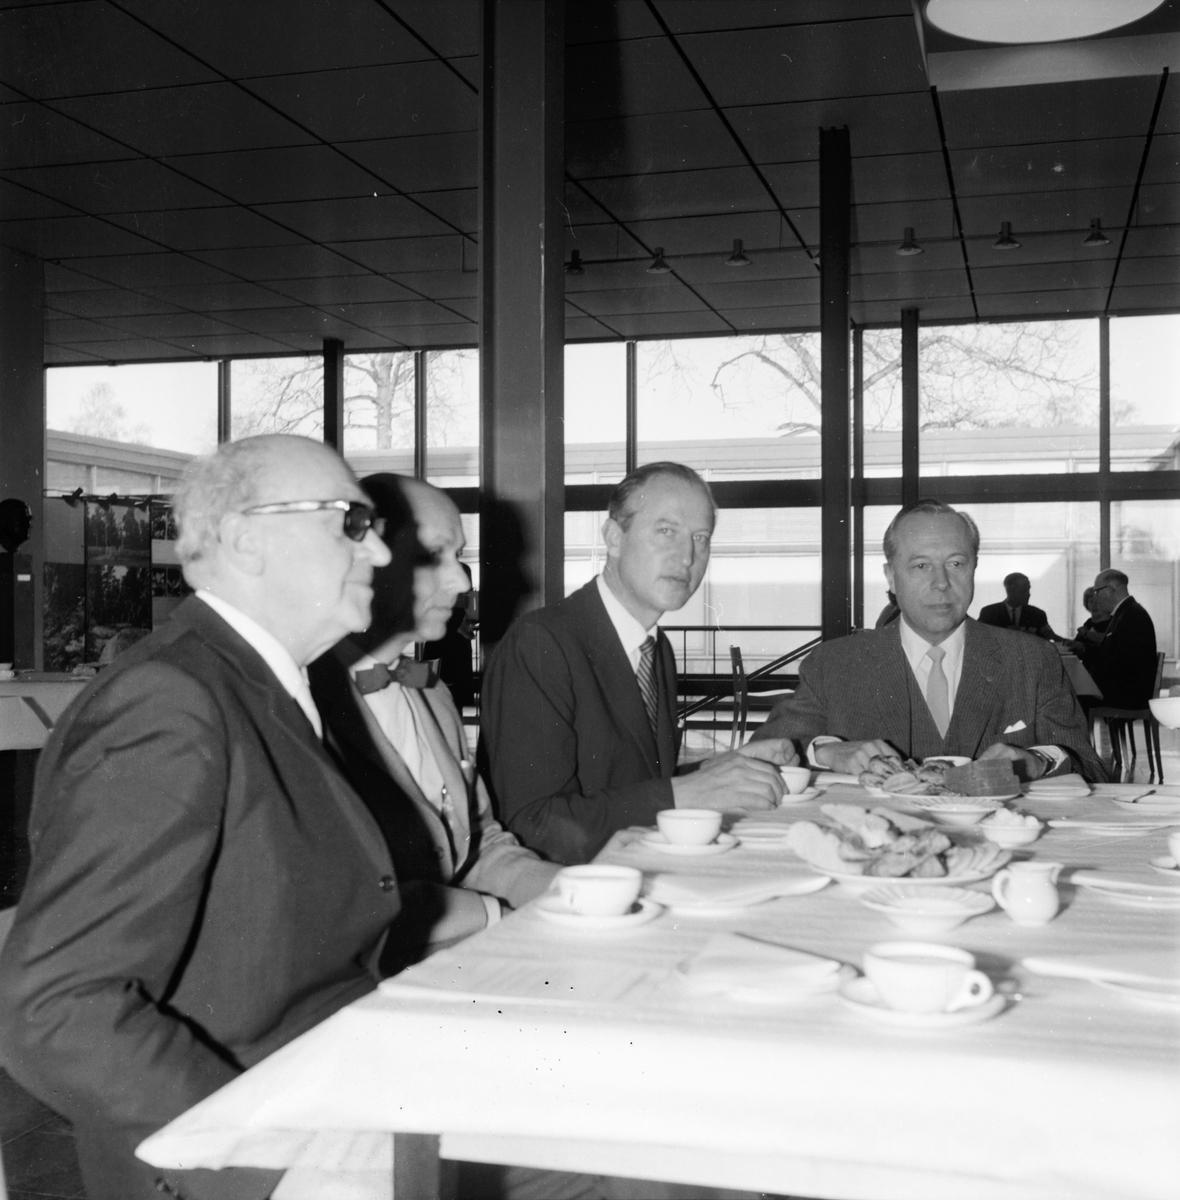 Polioförbundets årsmöte i Gävle. 14/5-1965